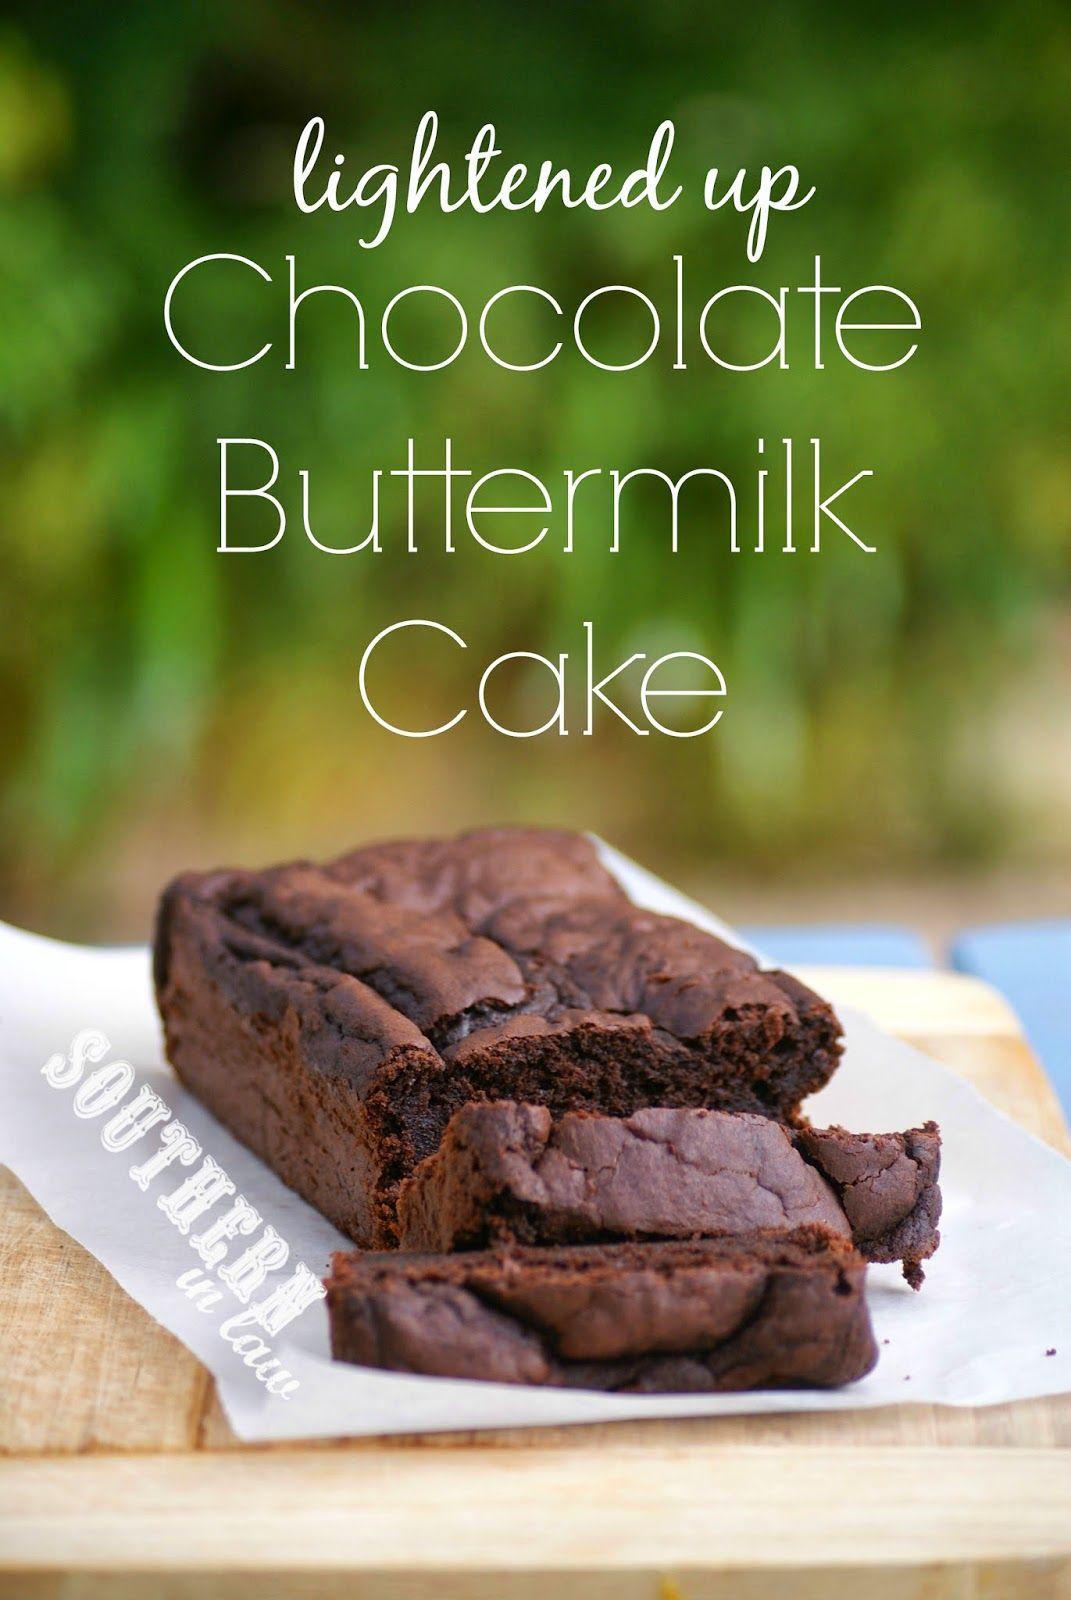 Recipe Lightened Up Chocolate Buttermilk Cake Buttermilk Recipes Buttermilk Chocolate Cake Cake Recipes